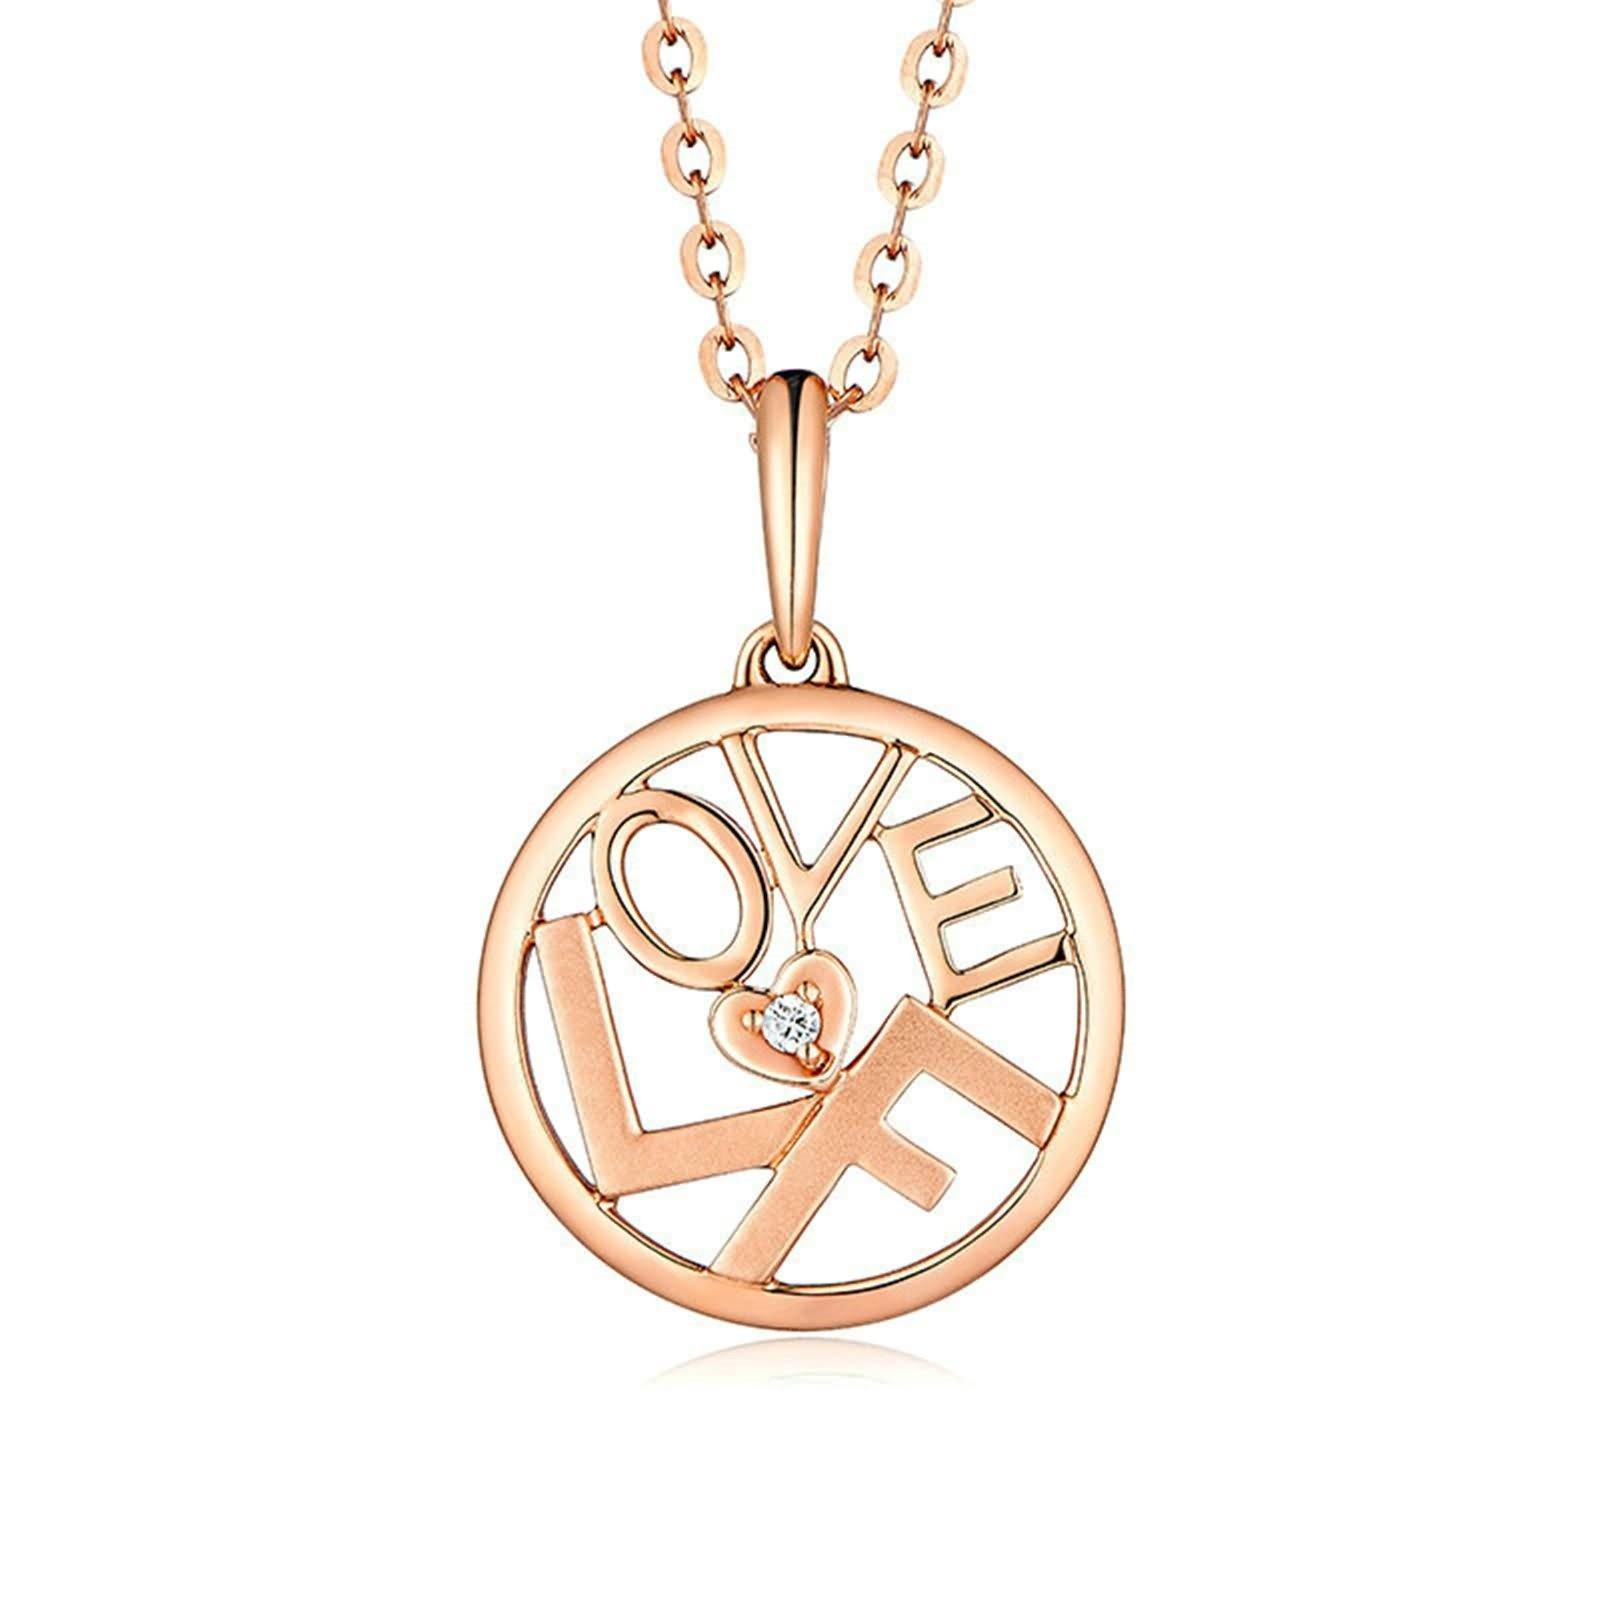 Adisaer 18k(750) Rose Gold Women Necklace 0.94g ''LOVEF''--Love Forever Round Diamond Wedding Necklace